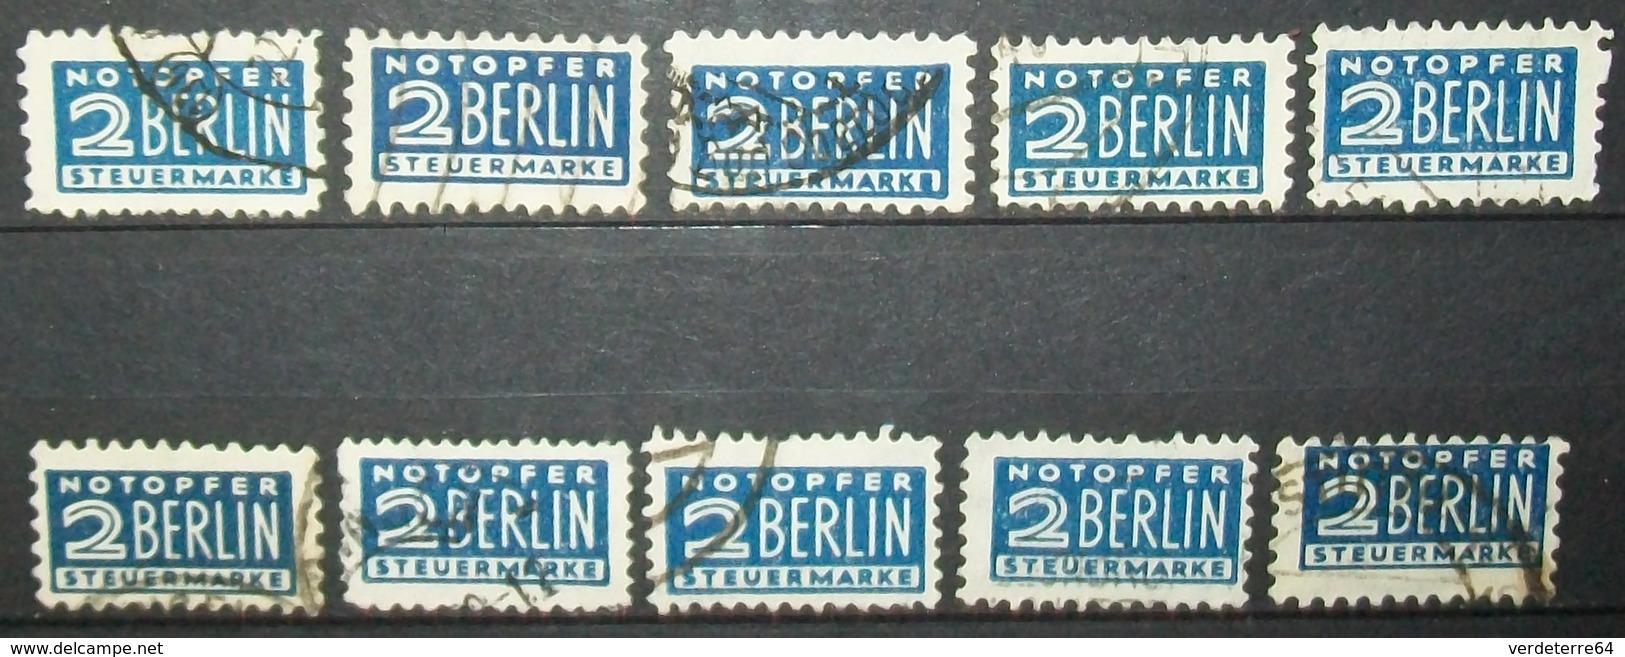 N°494A TIMBRES BERLIN STEUERMARKE OBLITERES - Oblitérés